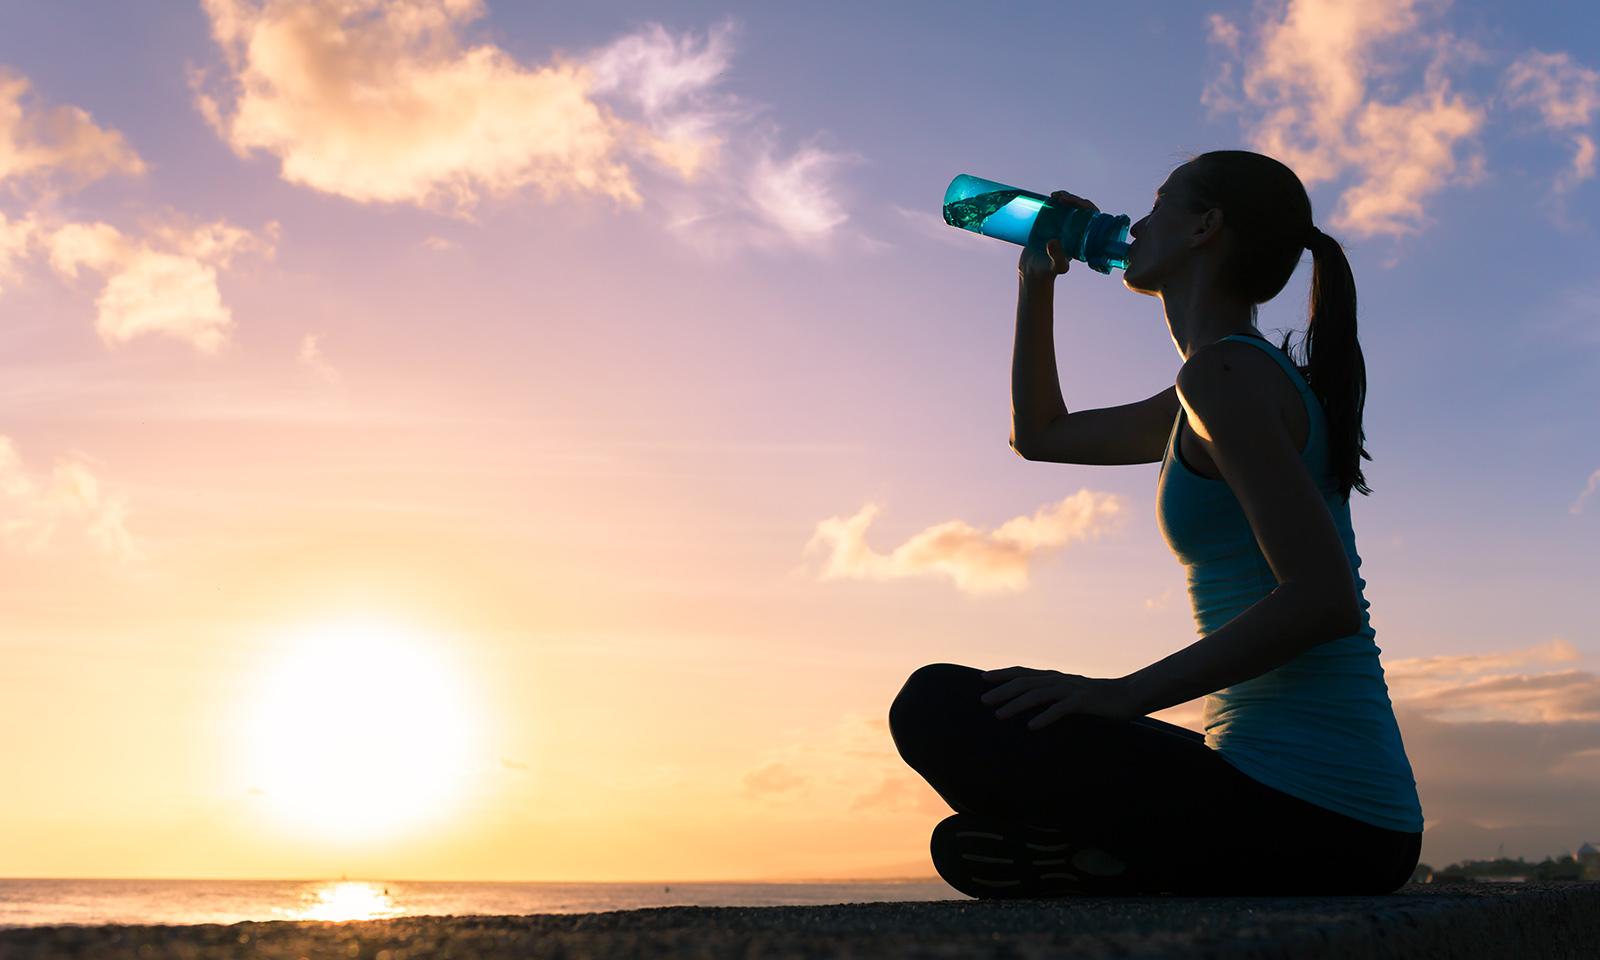 handy-tips-for-new-runners-main-image-runner-drinking-water-sunset